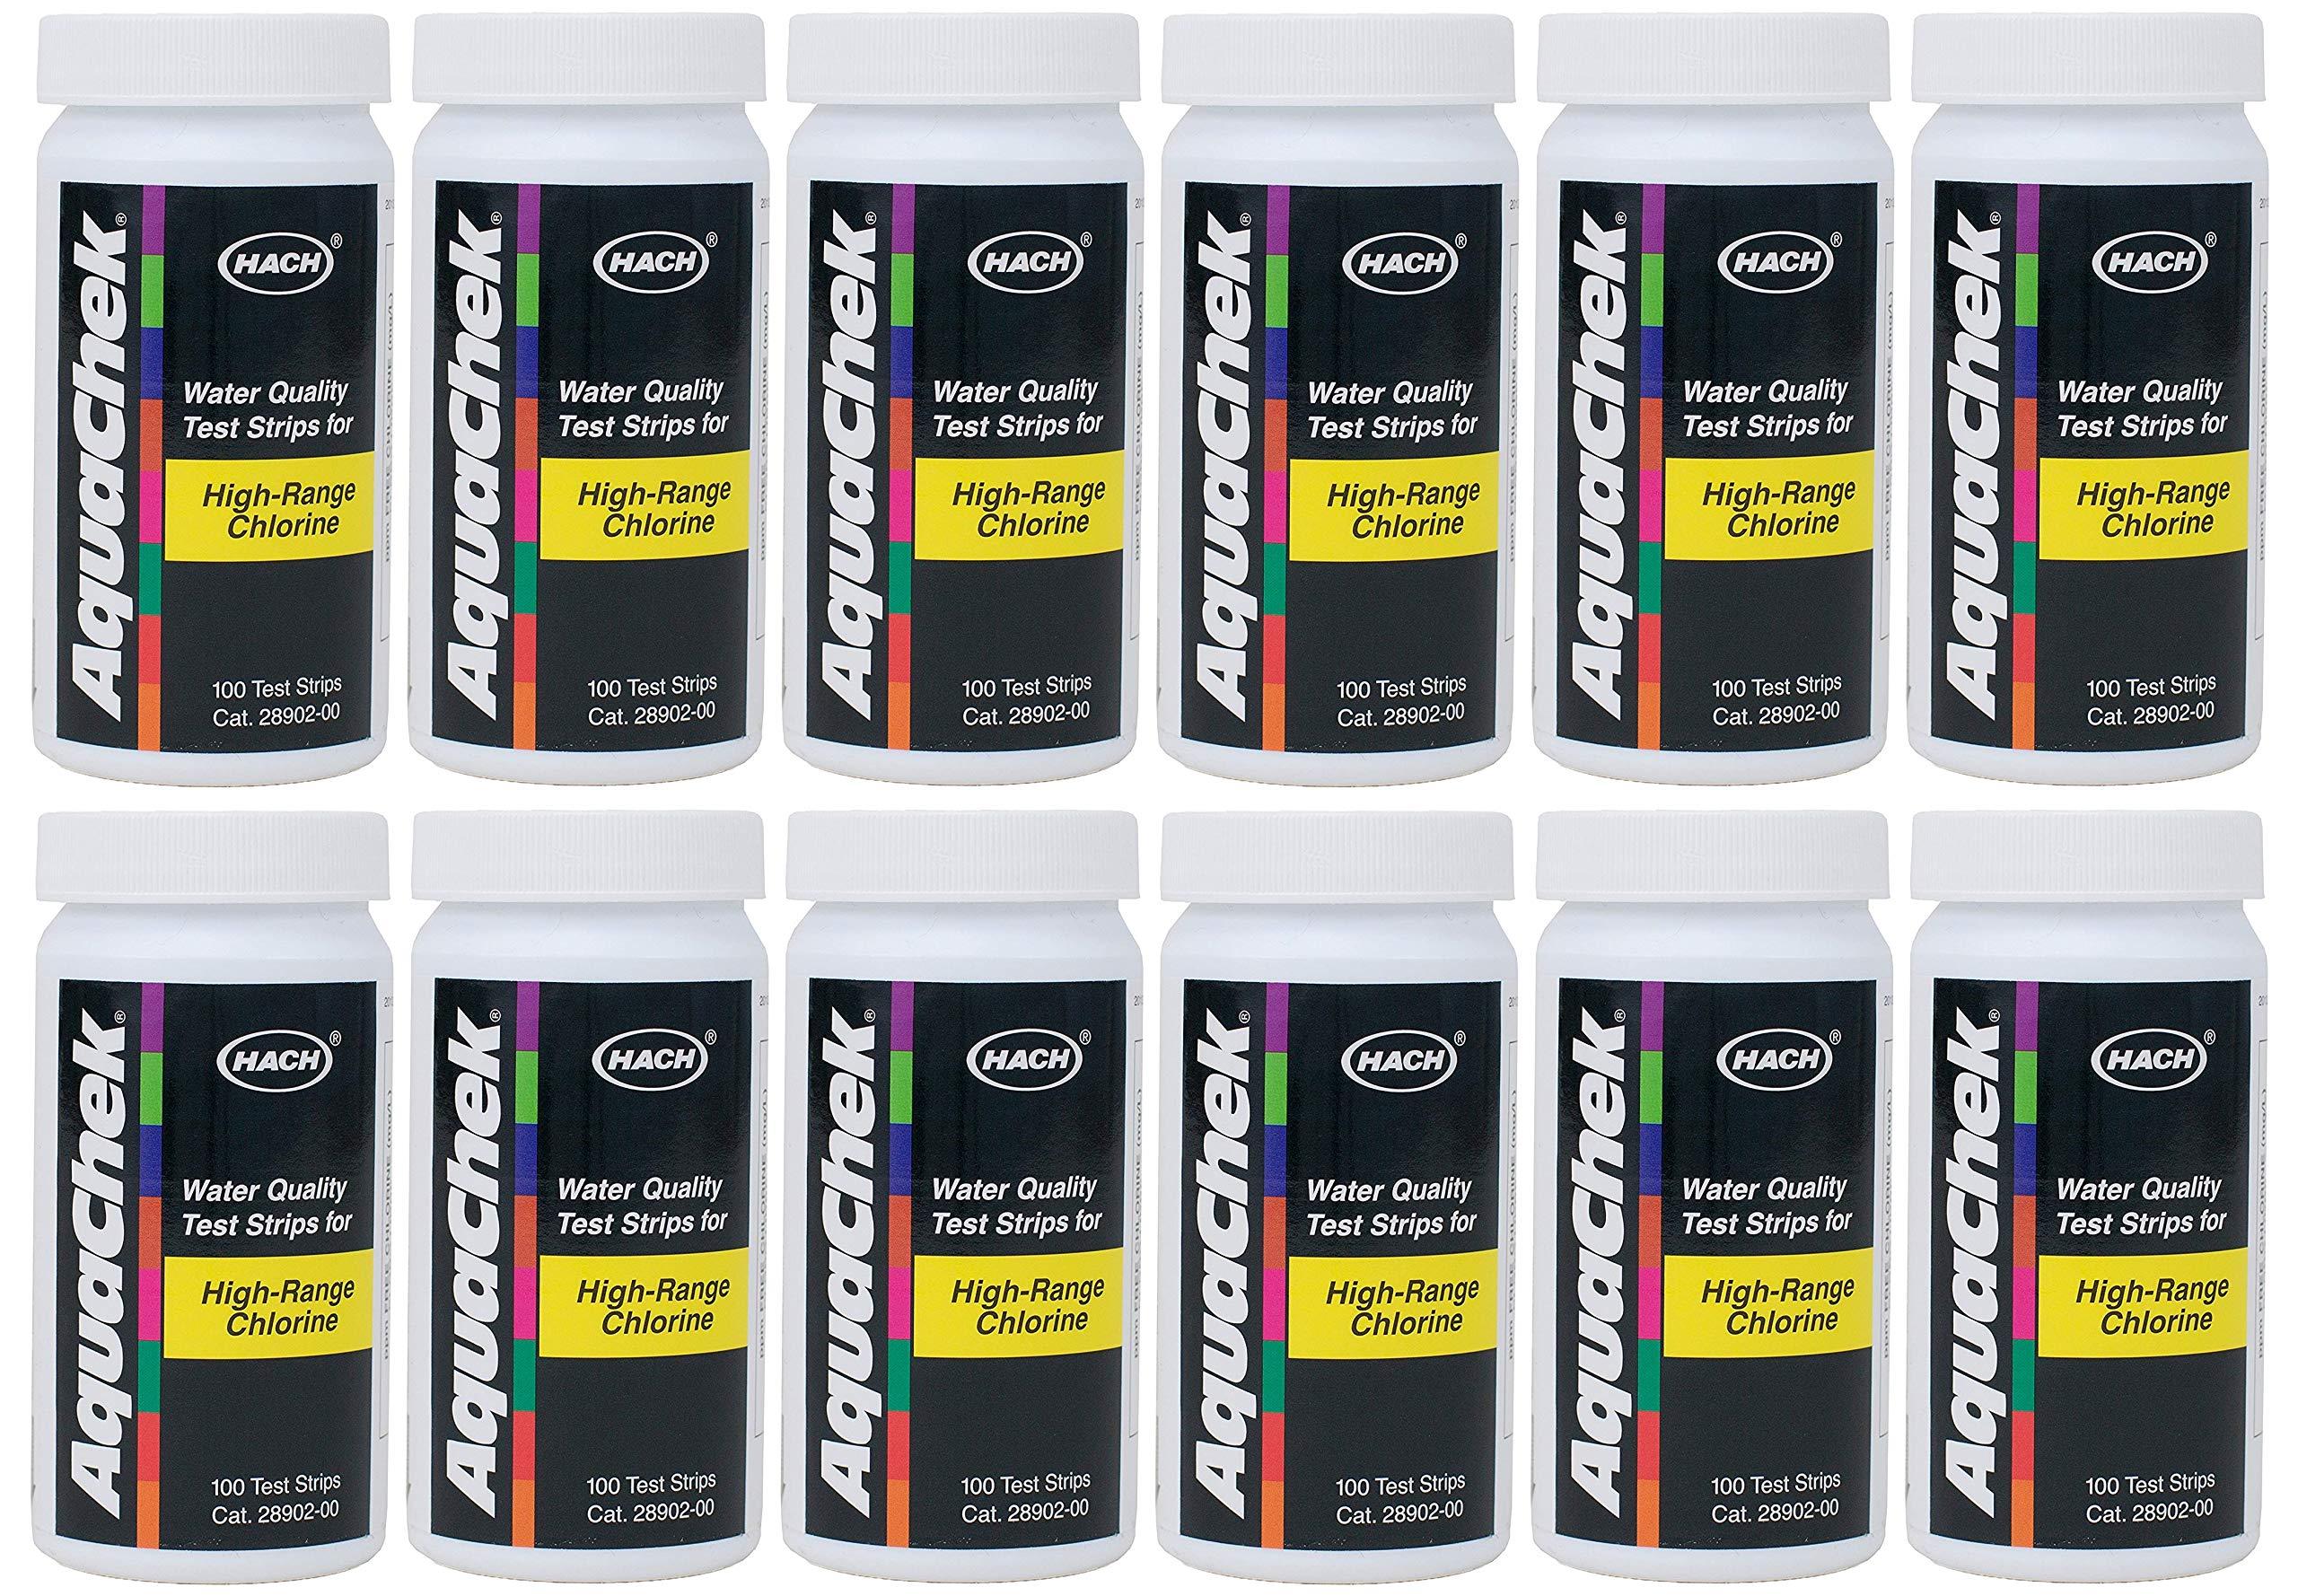 AquaChek High Range Chlorine Test Strips (100 Count) (12 Pack)